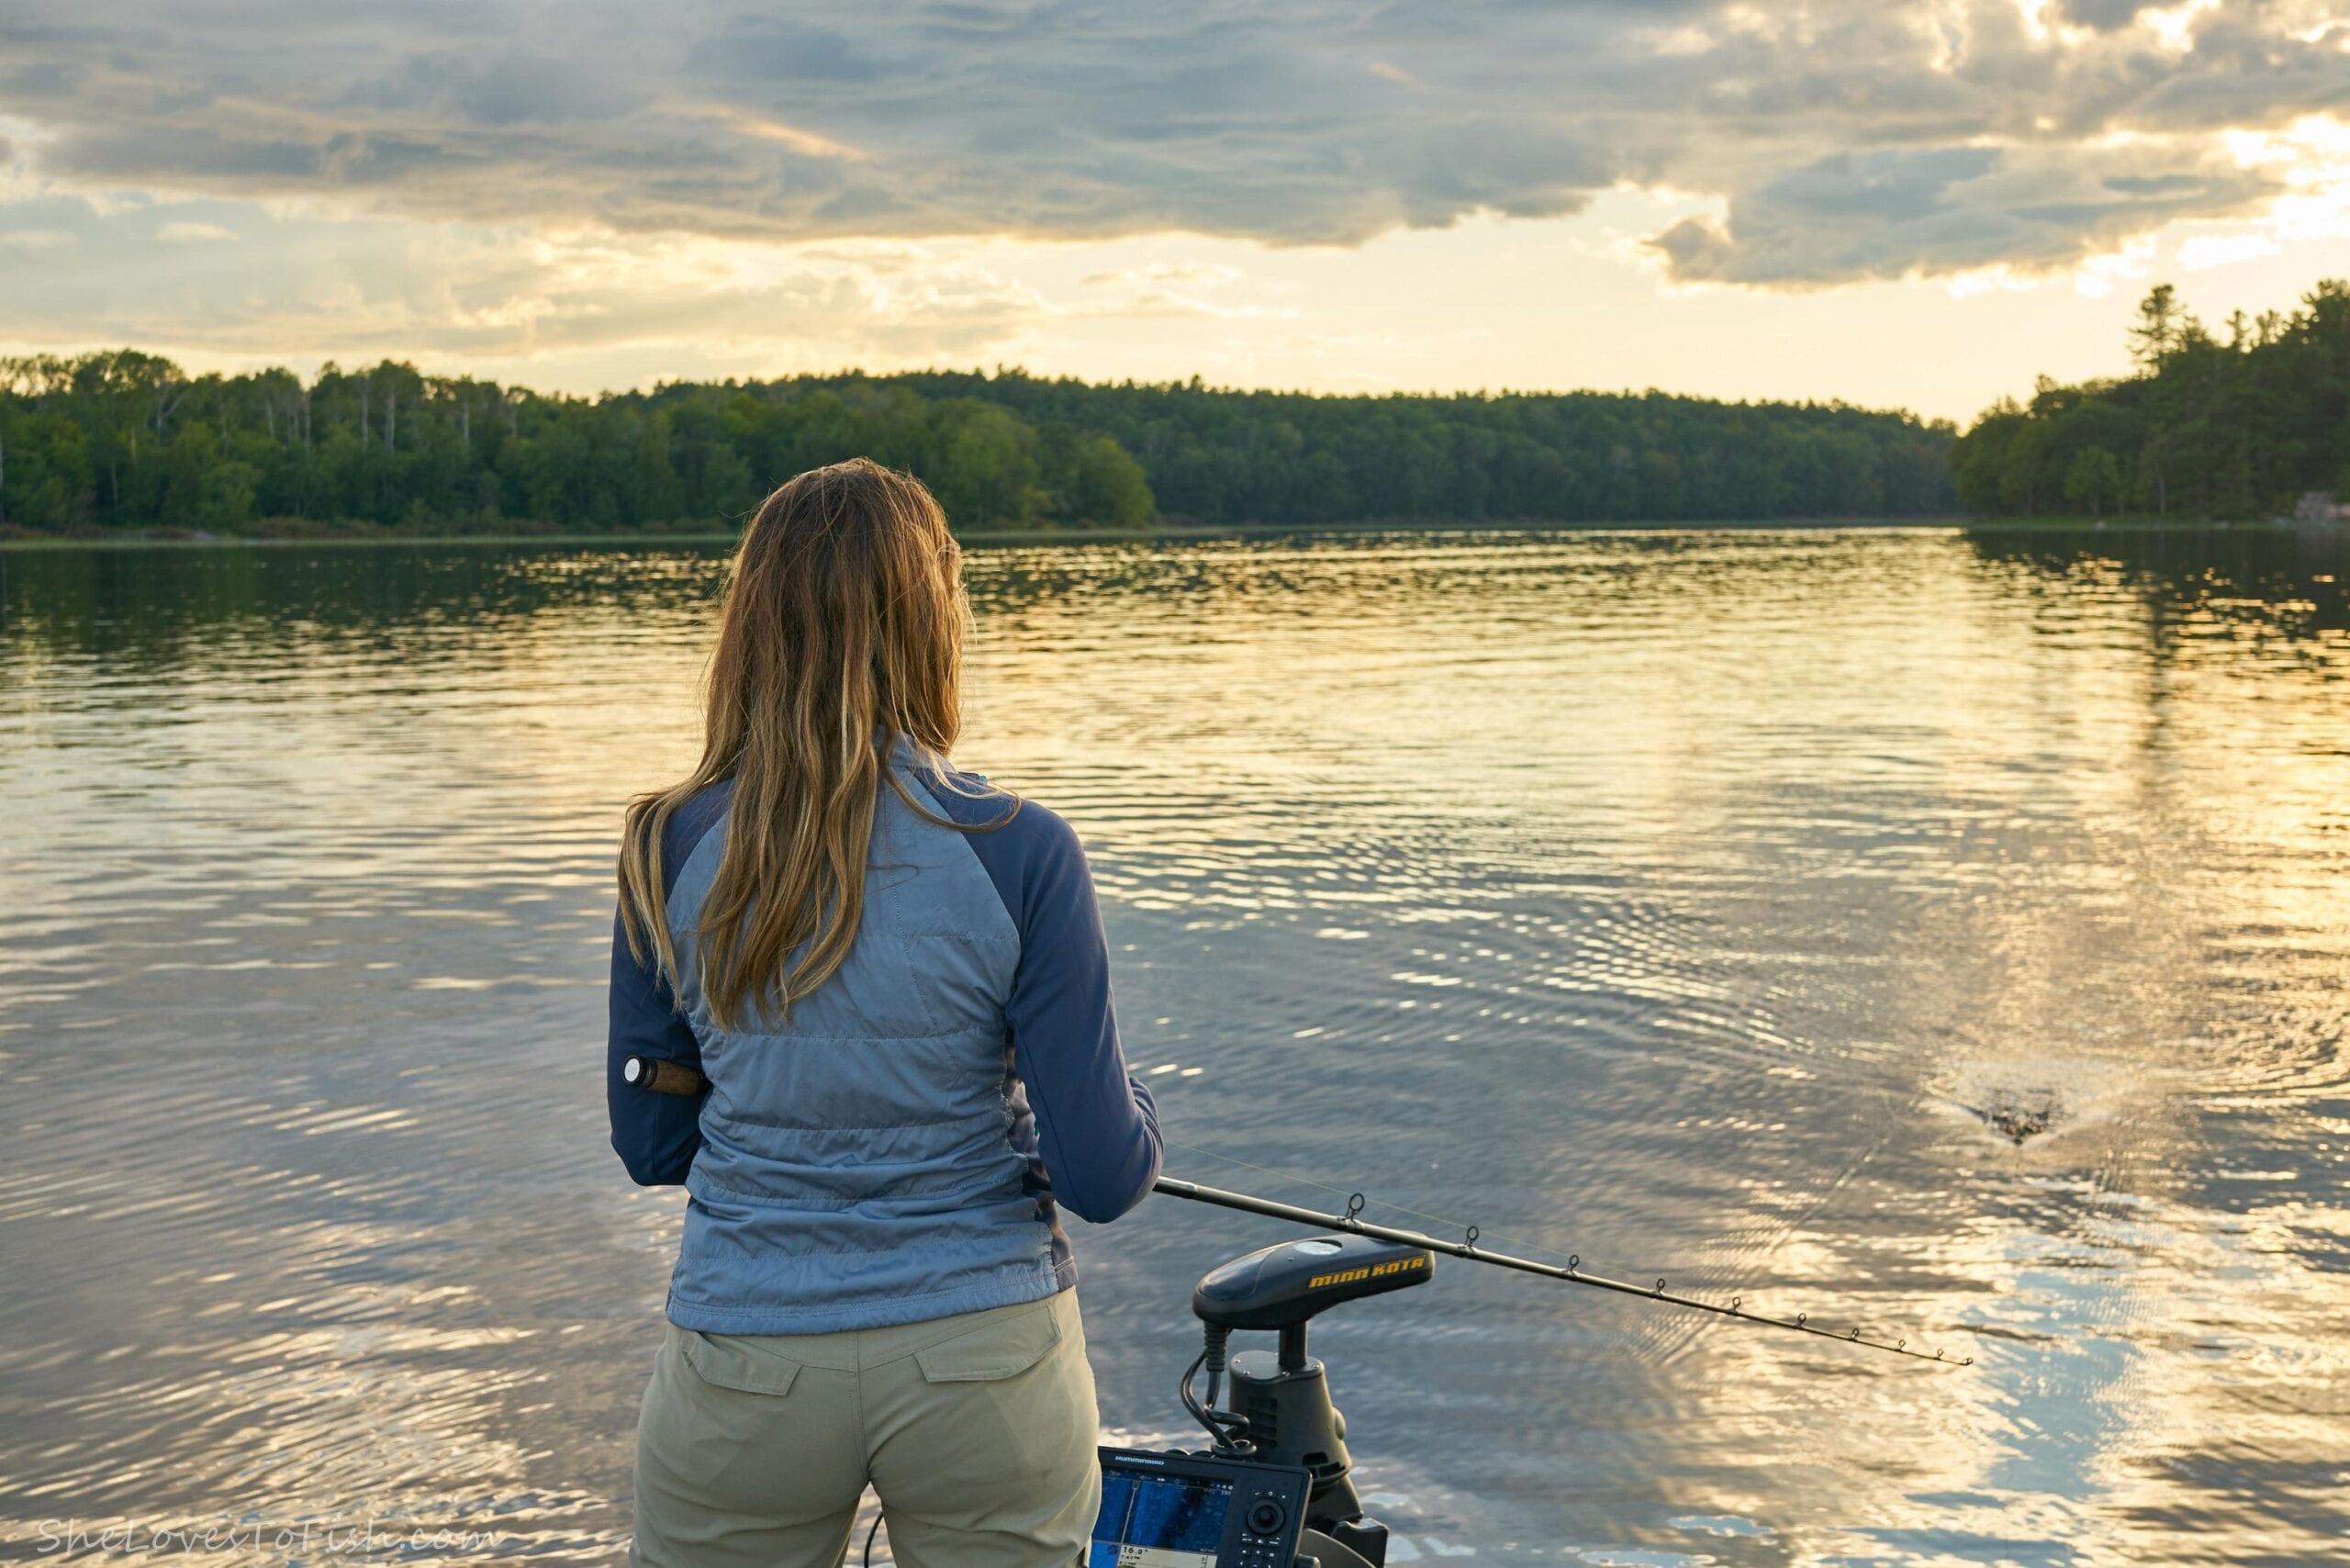 Ashley Rae, SheLovesToFish, French River Landscape, Northern Ontario Provincial Park, Fishing Canada